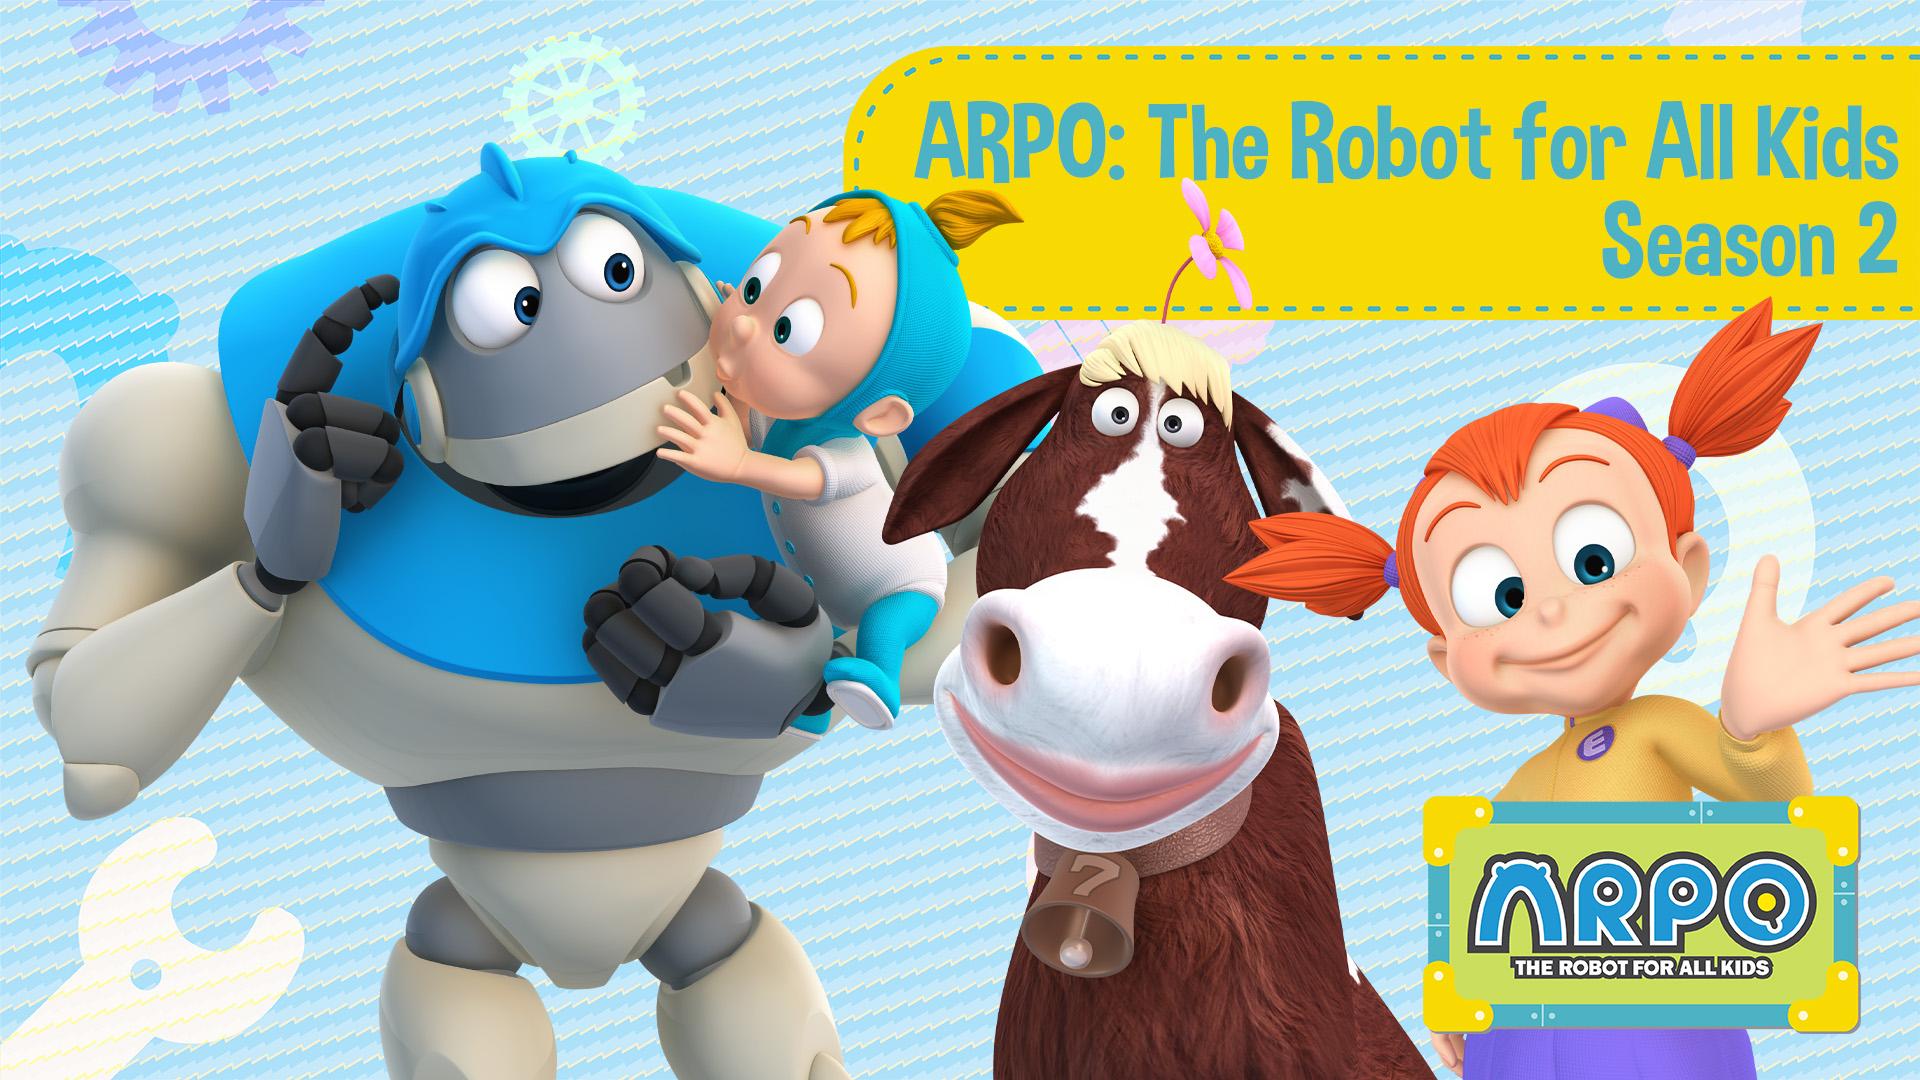 Arpo: The Robot for All Kids - Season 2